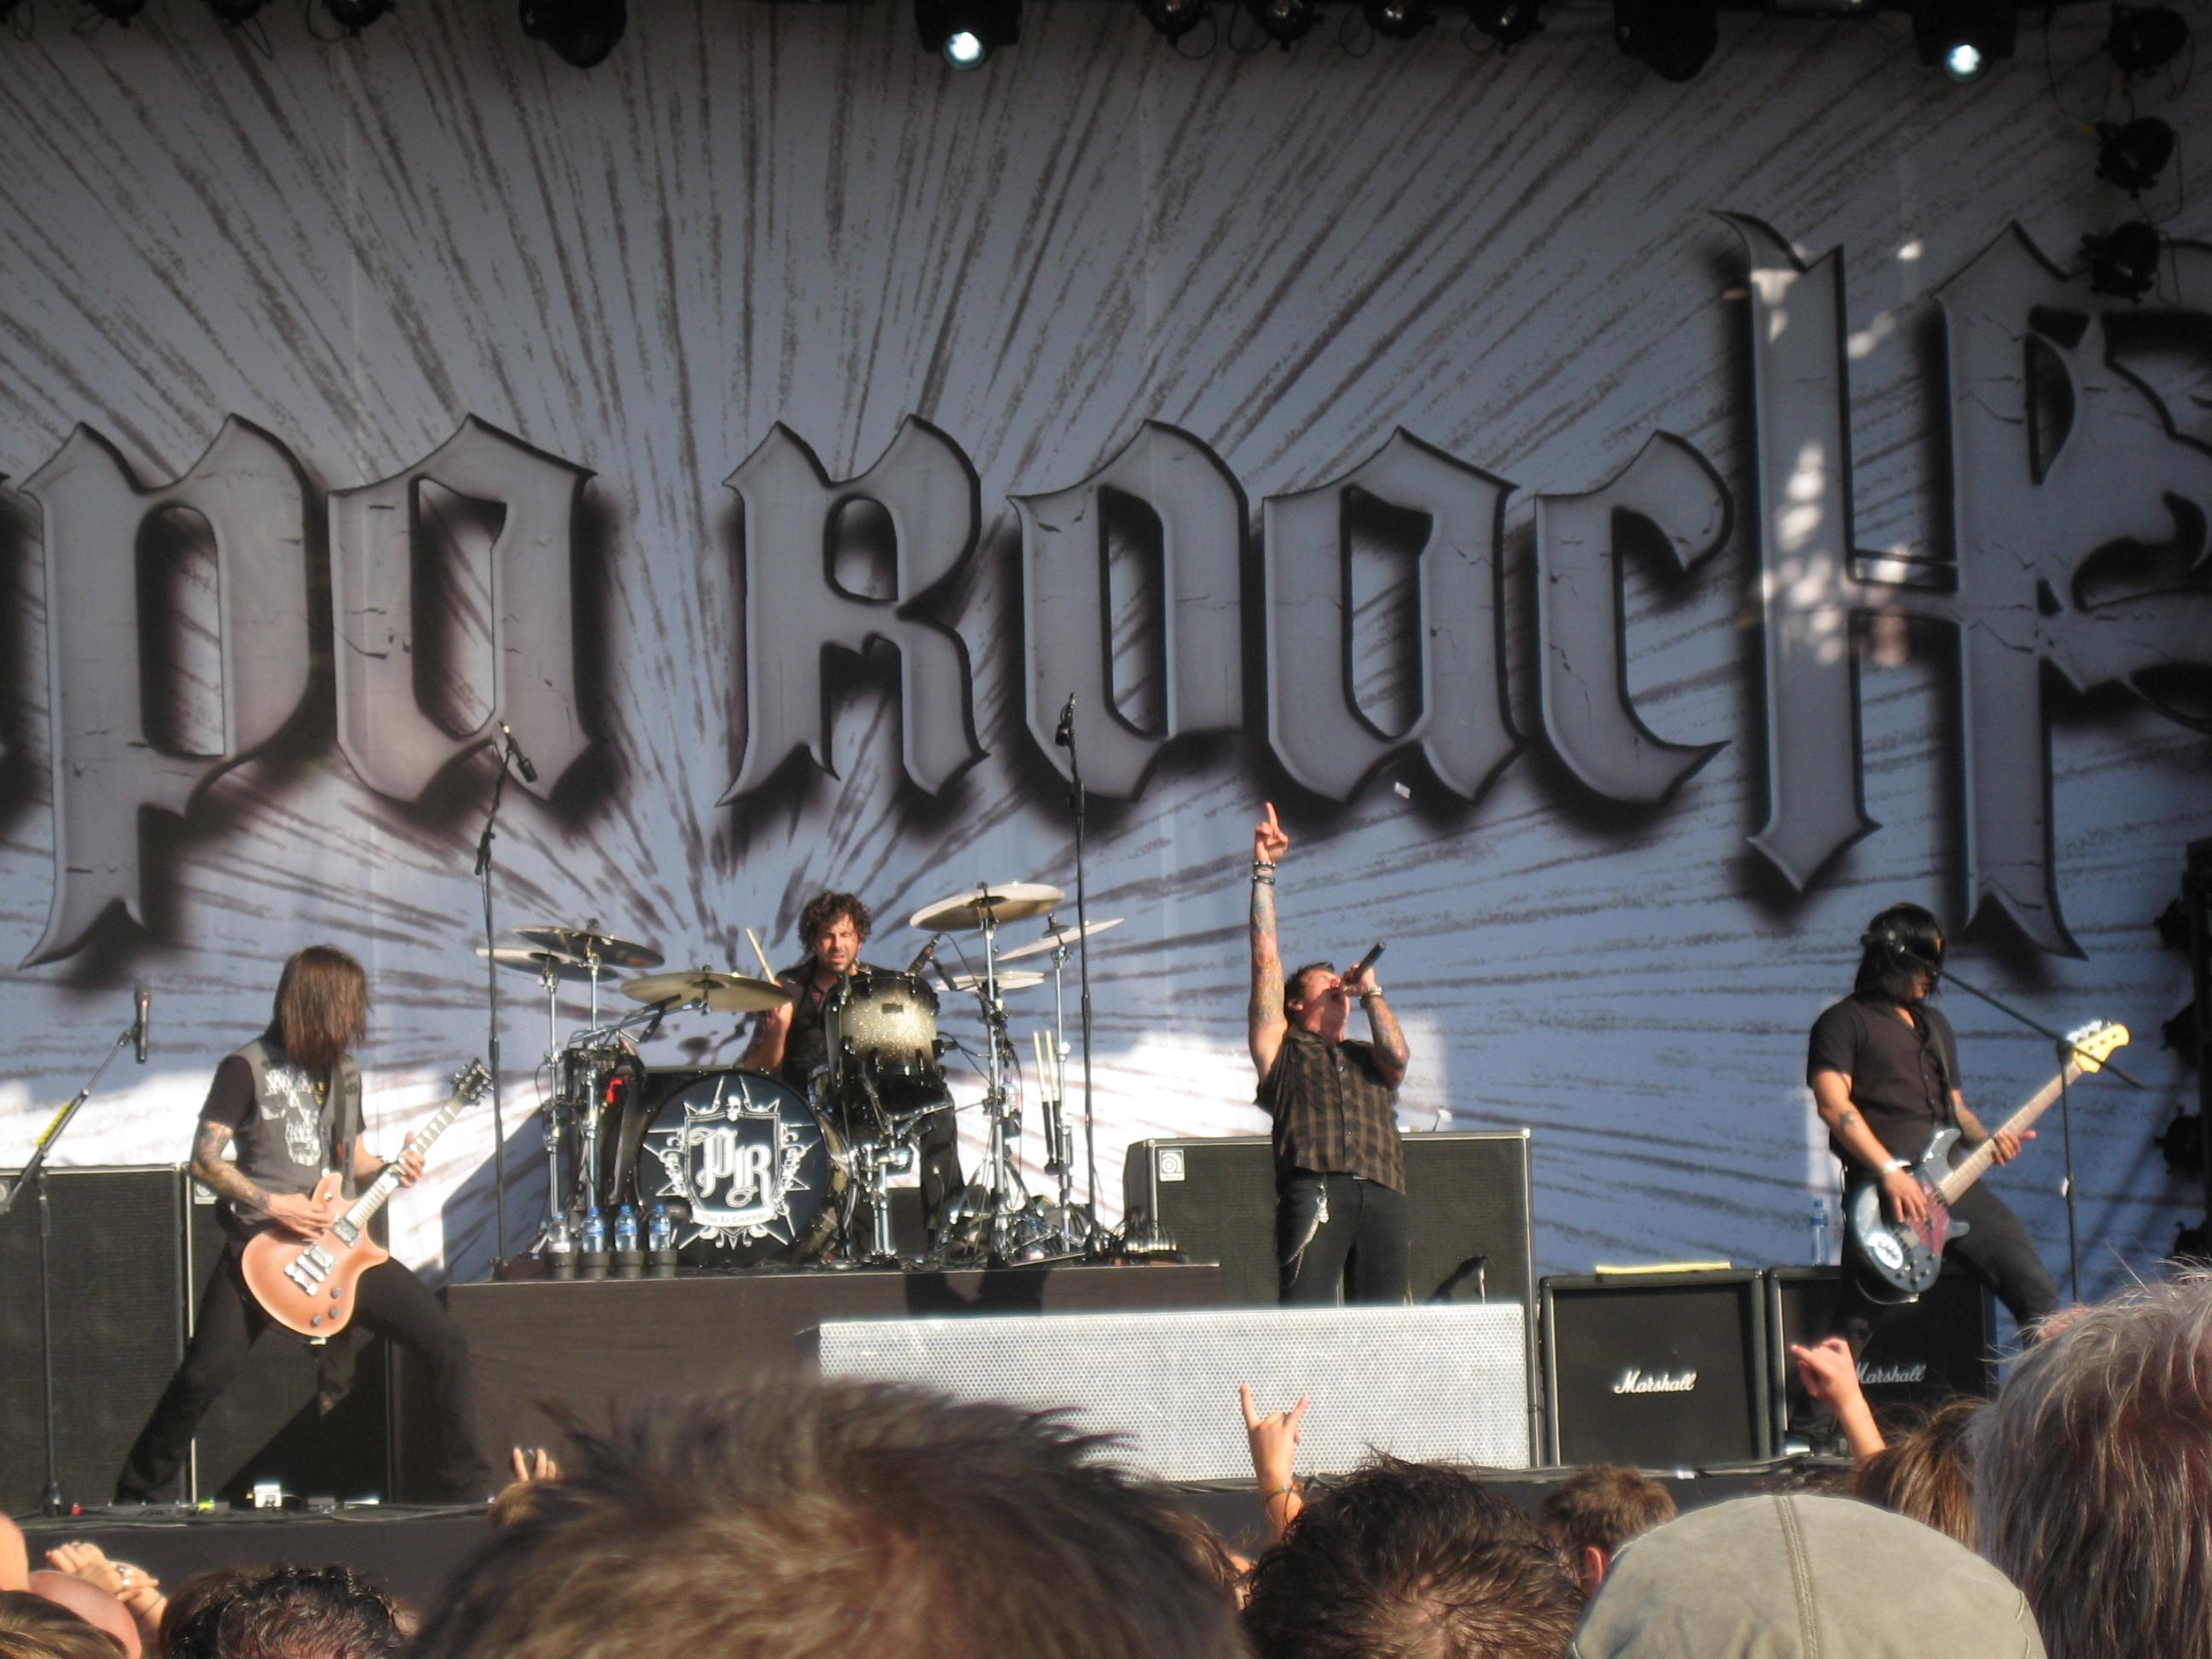 Papa Roach Guitar Chords Guitar Tabs And Lyrics Album From Chordie